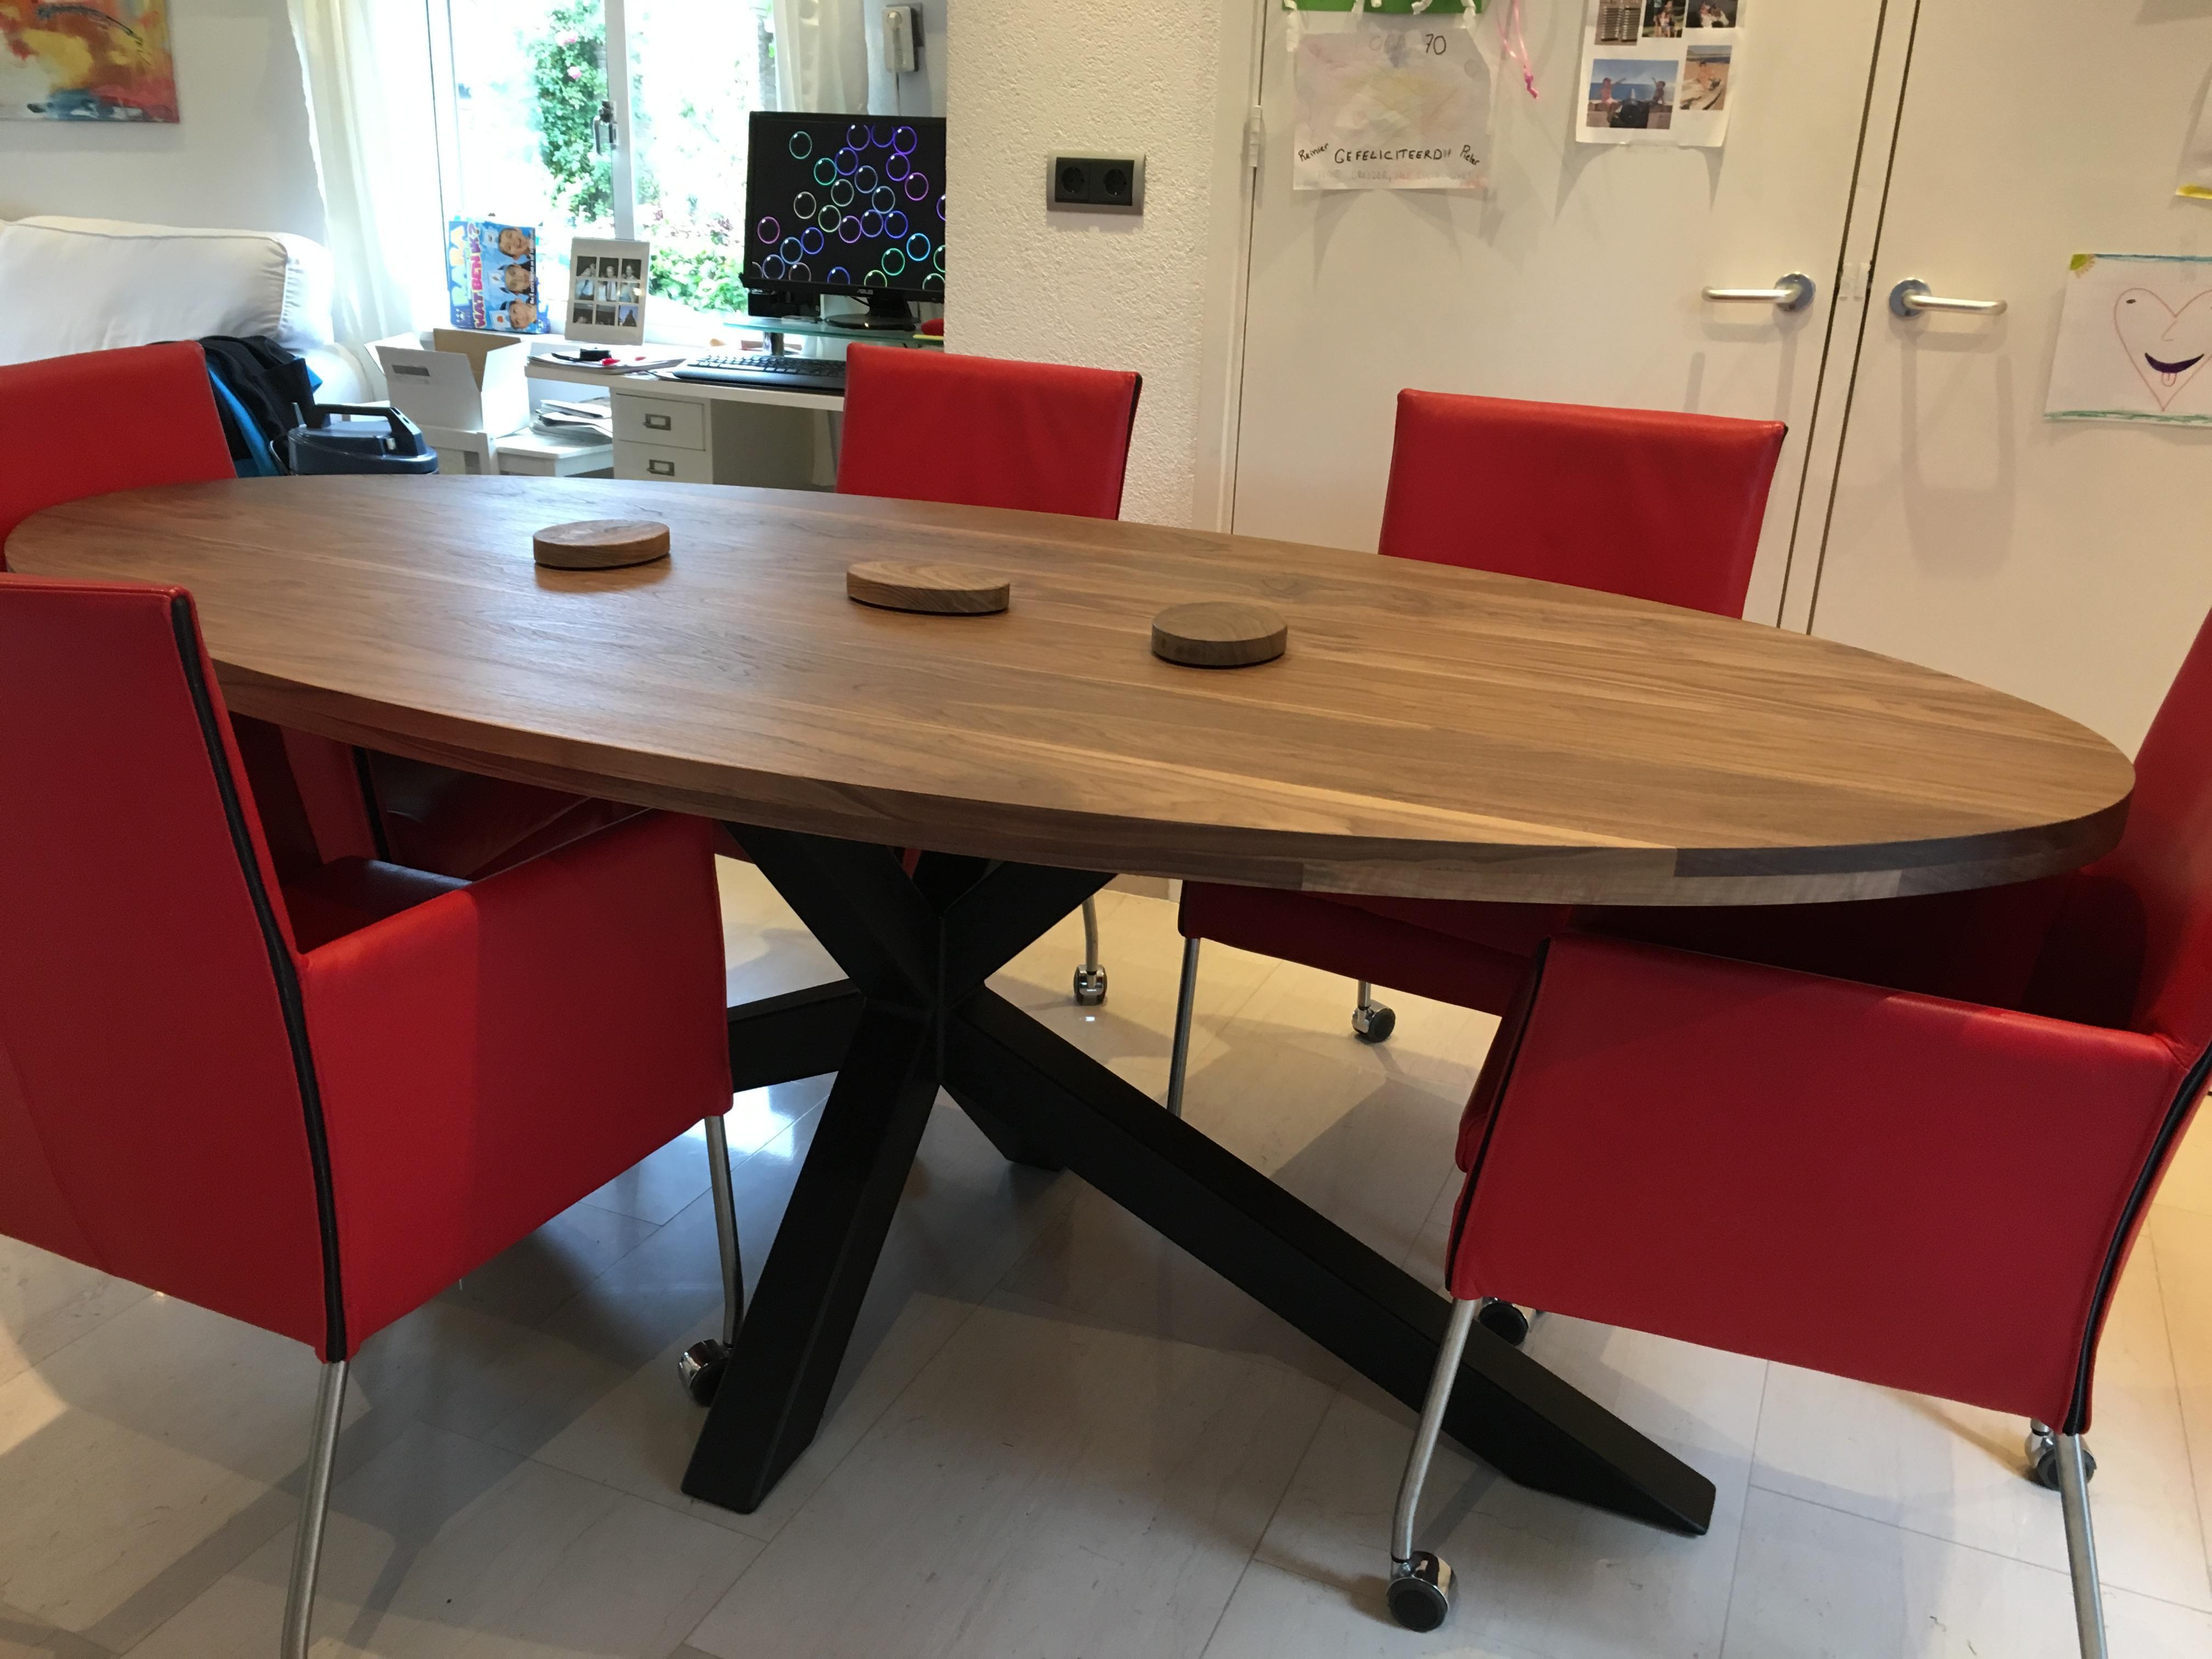 Toffe tafels ronde ovale tafels